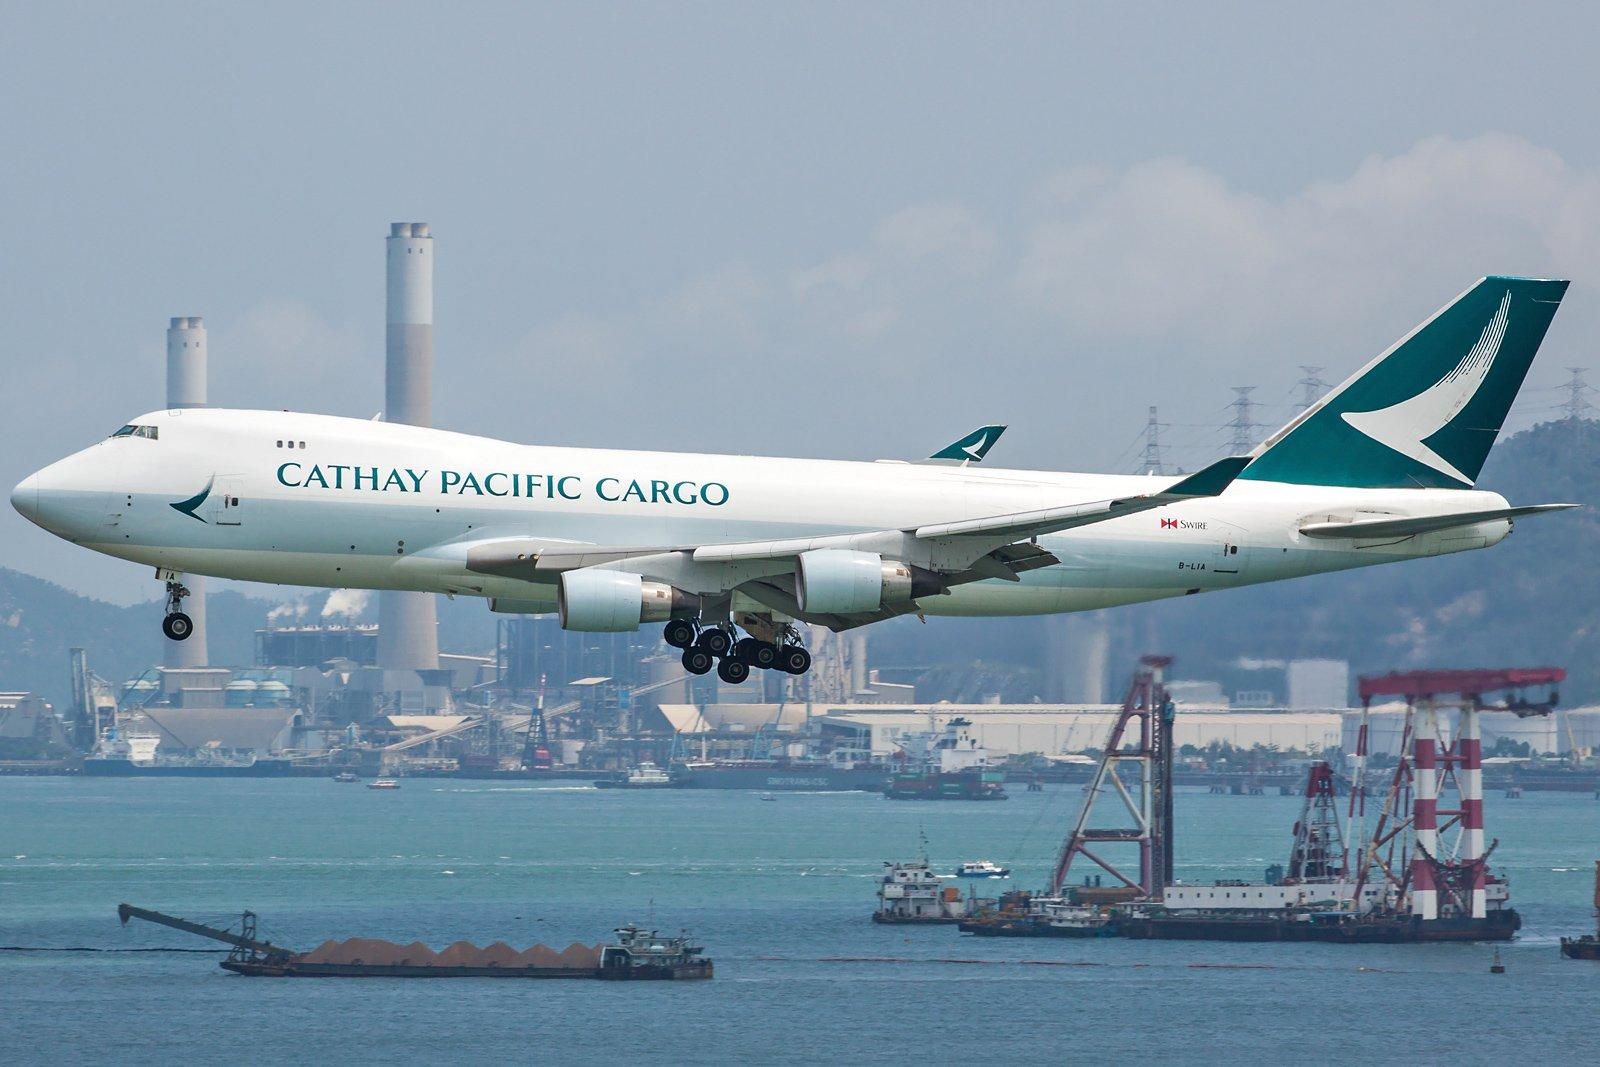 Cathay Pacific Boeing 747-467F(ER) B-LIA